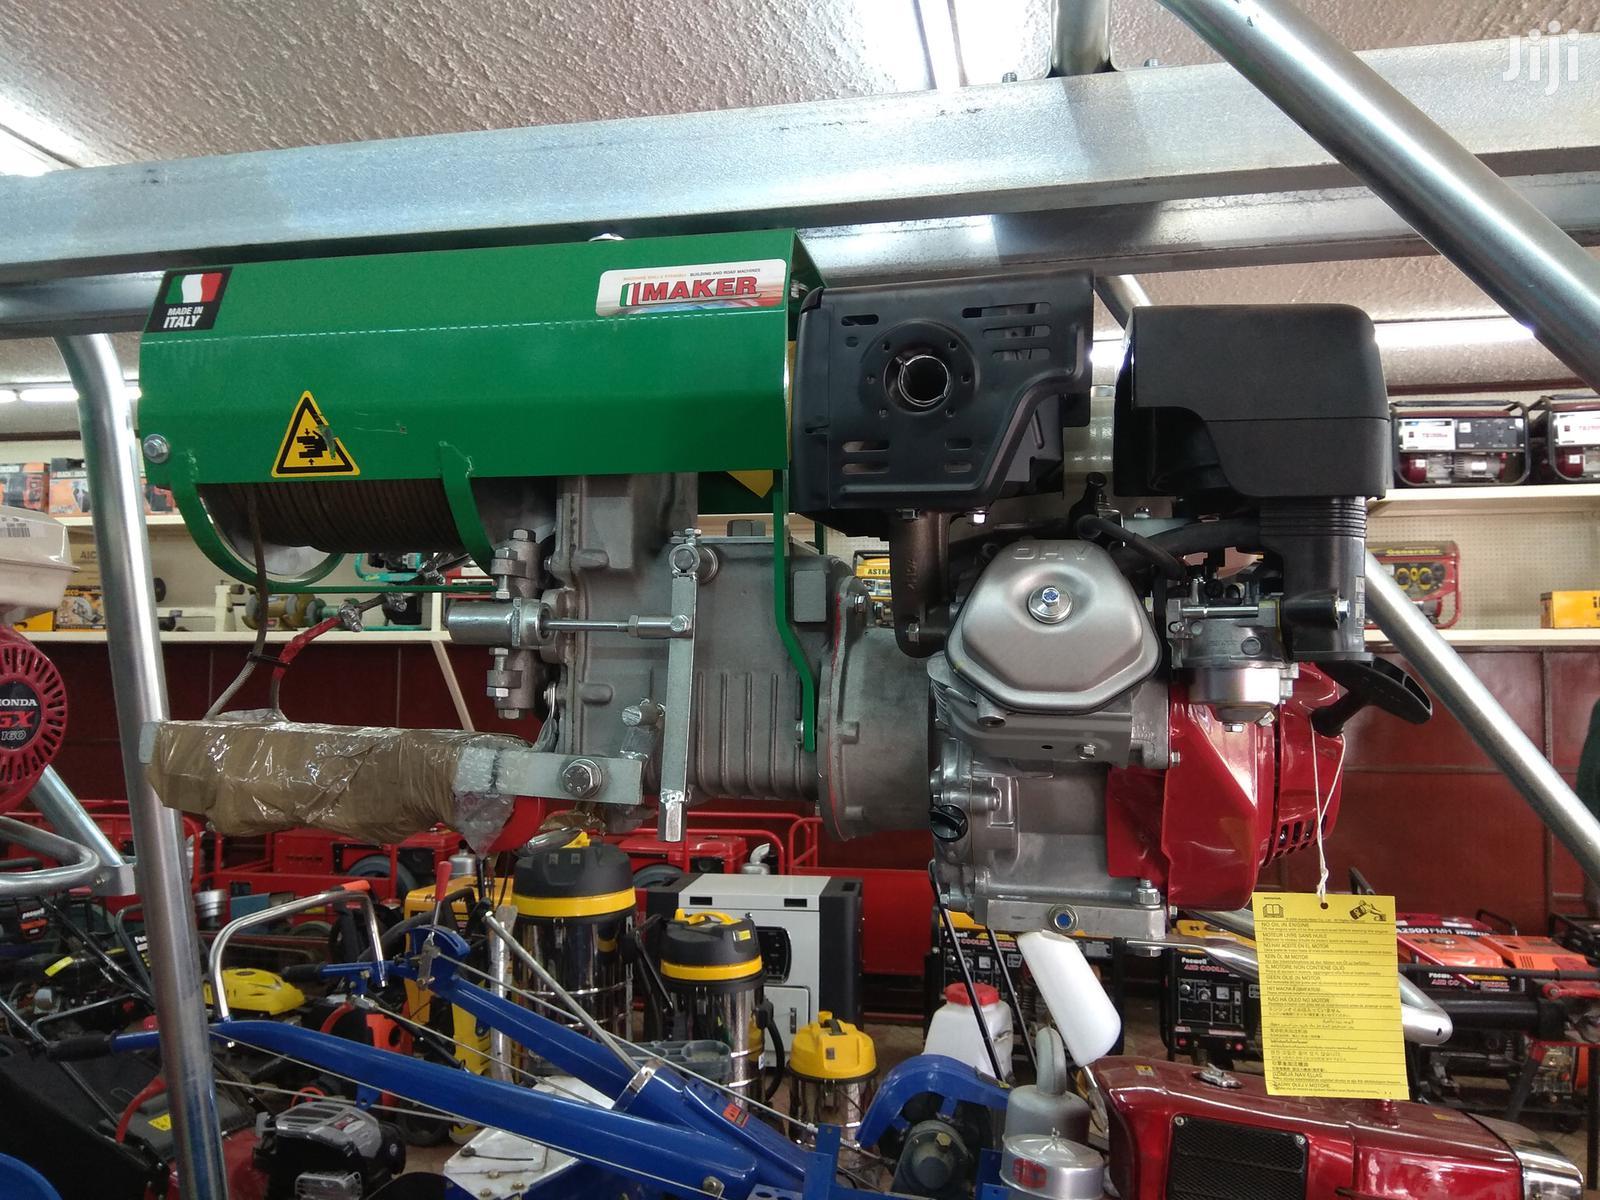 2020 Maker Italy Concrete Hoist Crane 0.5 Ton And 1 Ton   Manufacturing Equipment for sale in Ngara, Nairobi, Kenya